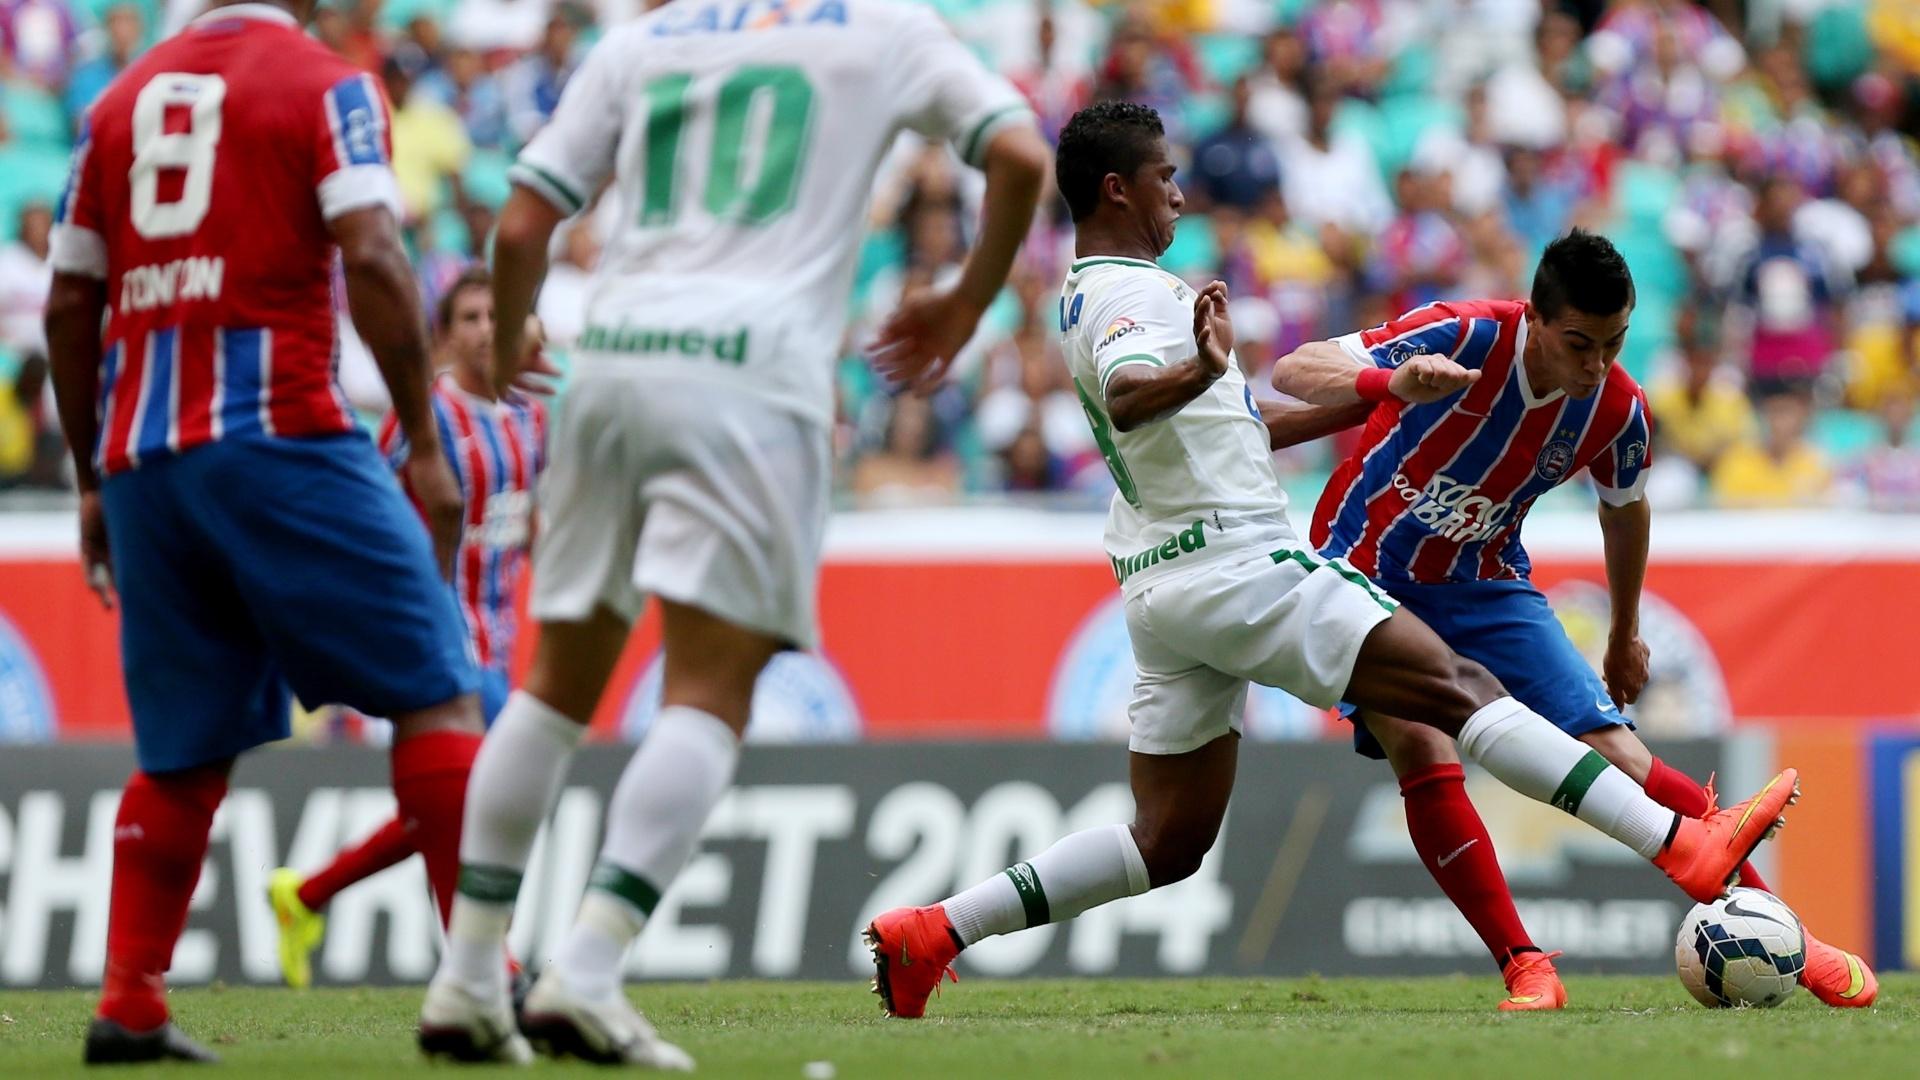 Emanuel, do Bahia, tenta completar passe contra a Chapecoense